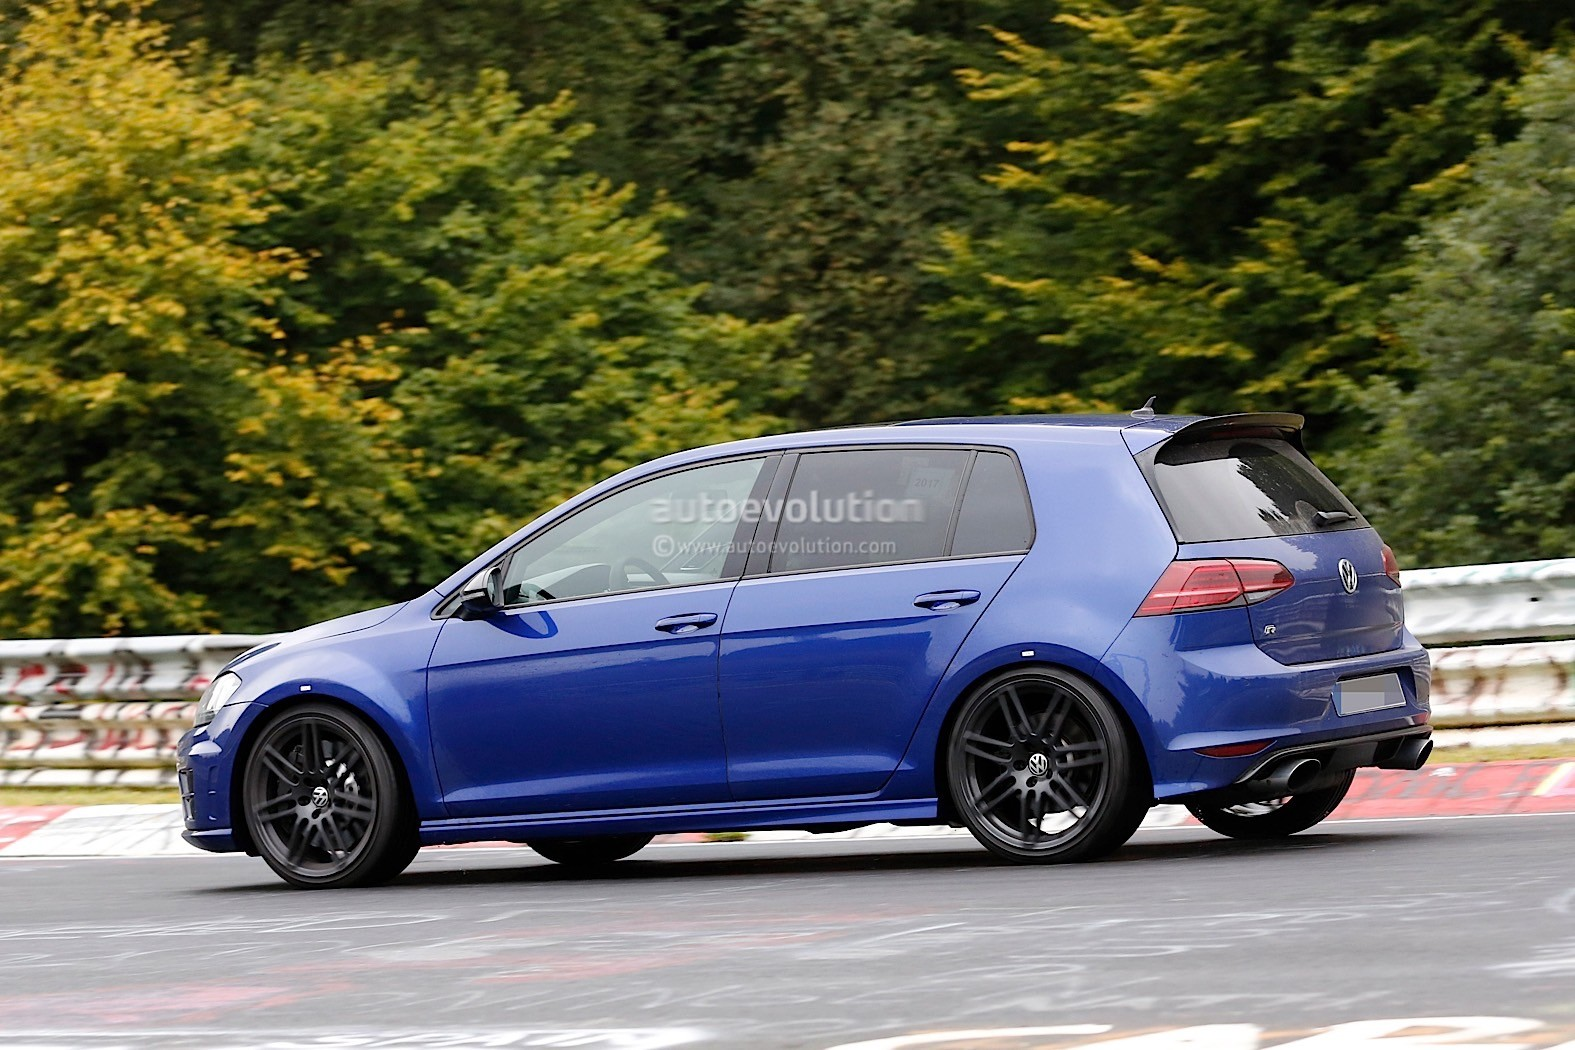 Spyshots: Volkswagen Golf R Mule With Audi RS3 Exhaust Tips Signals